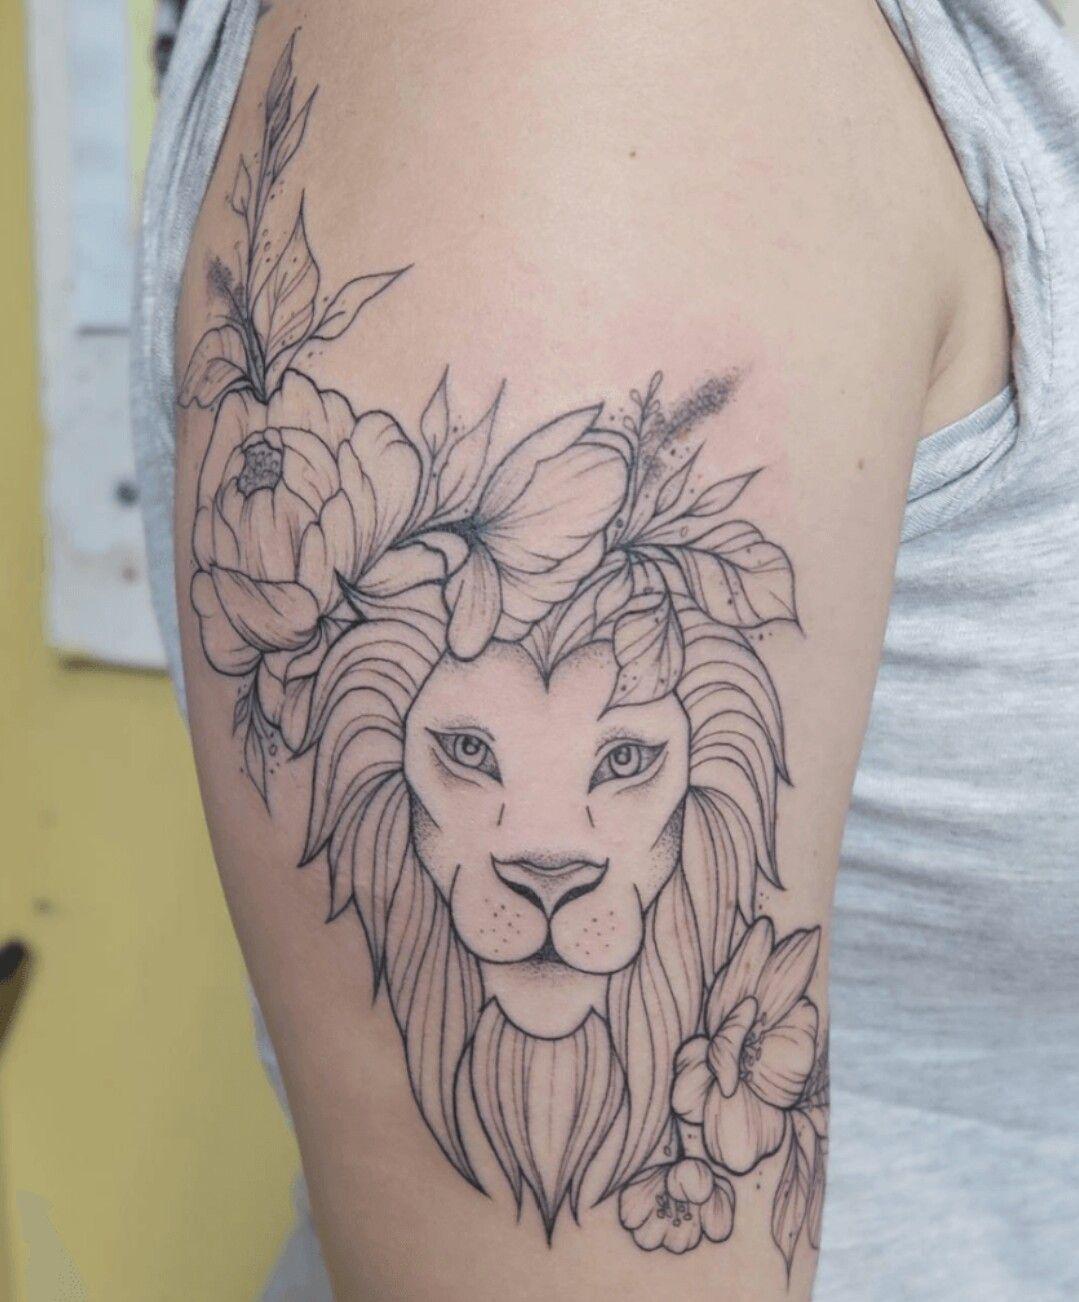 Pin de Koral Martinez em Tattoo ideas Tatuagem feminina